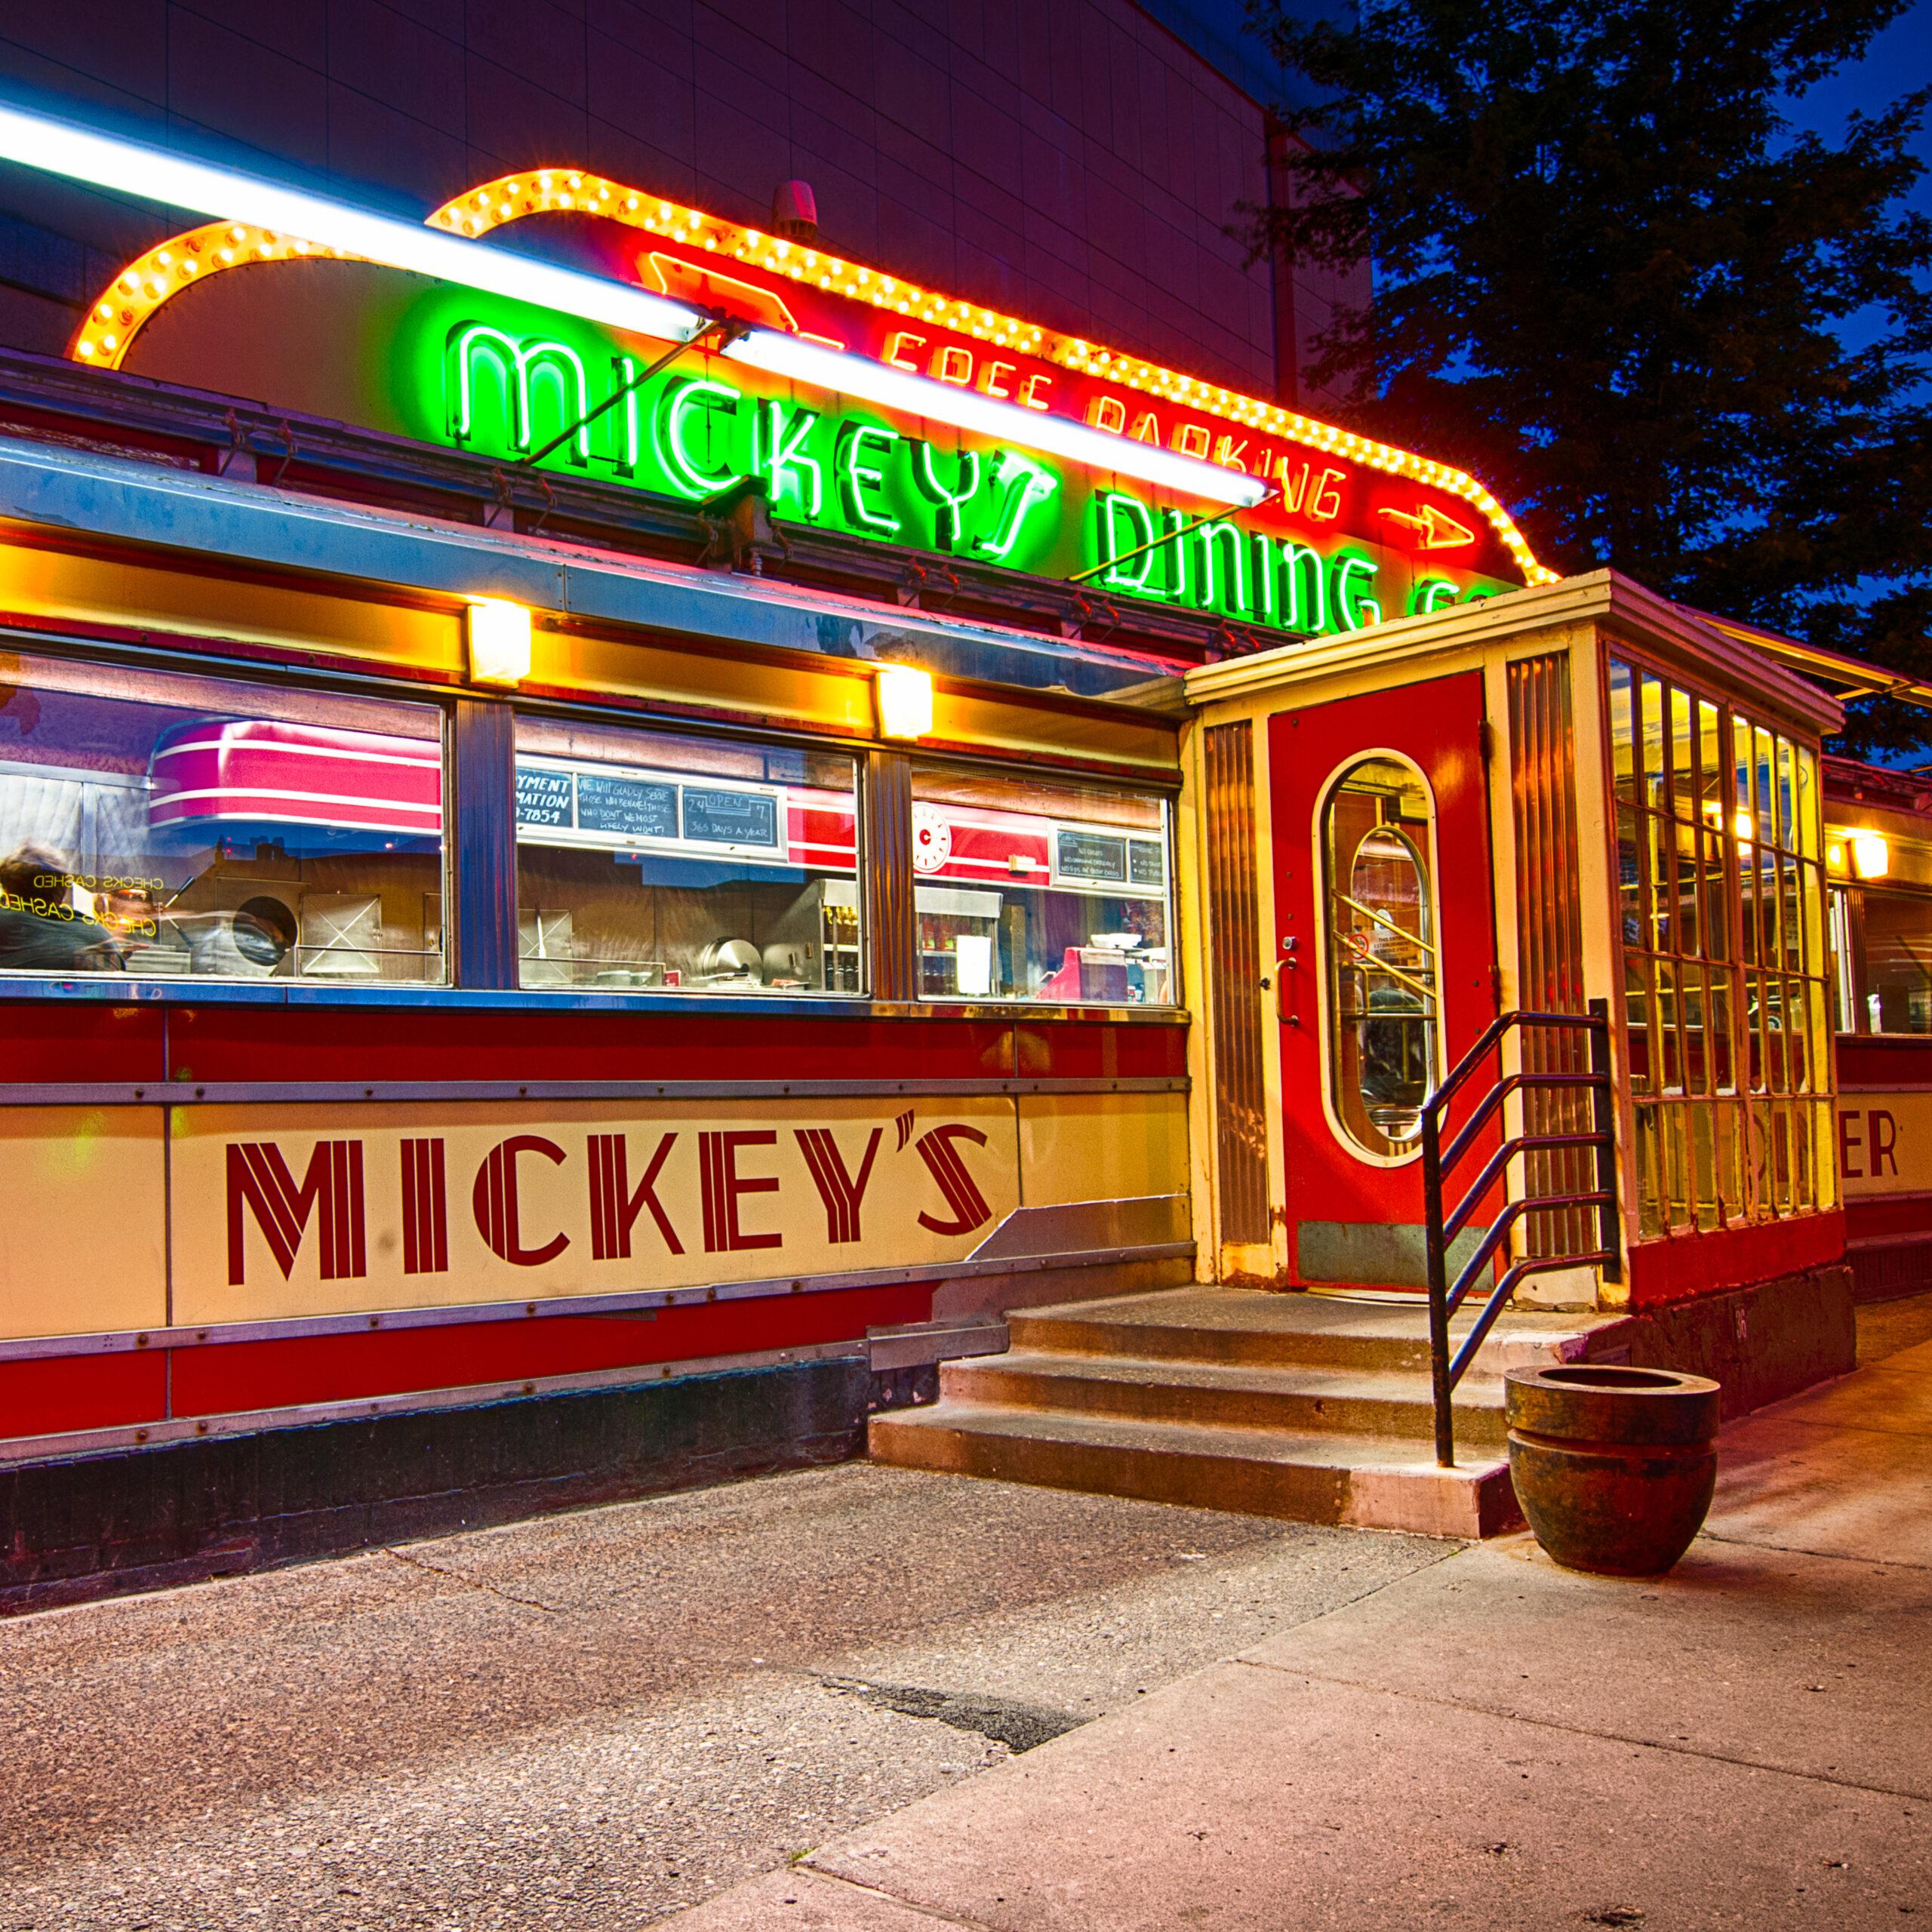 Mickey's Dinner, St. Paul, MN